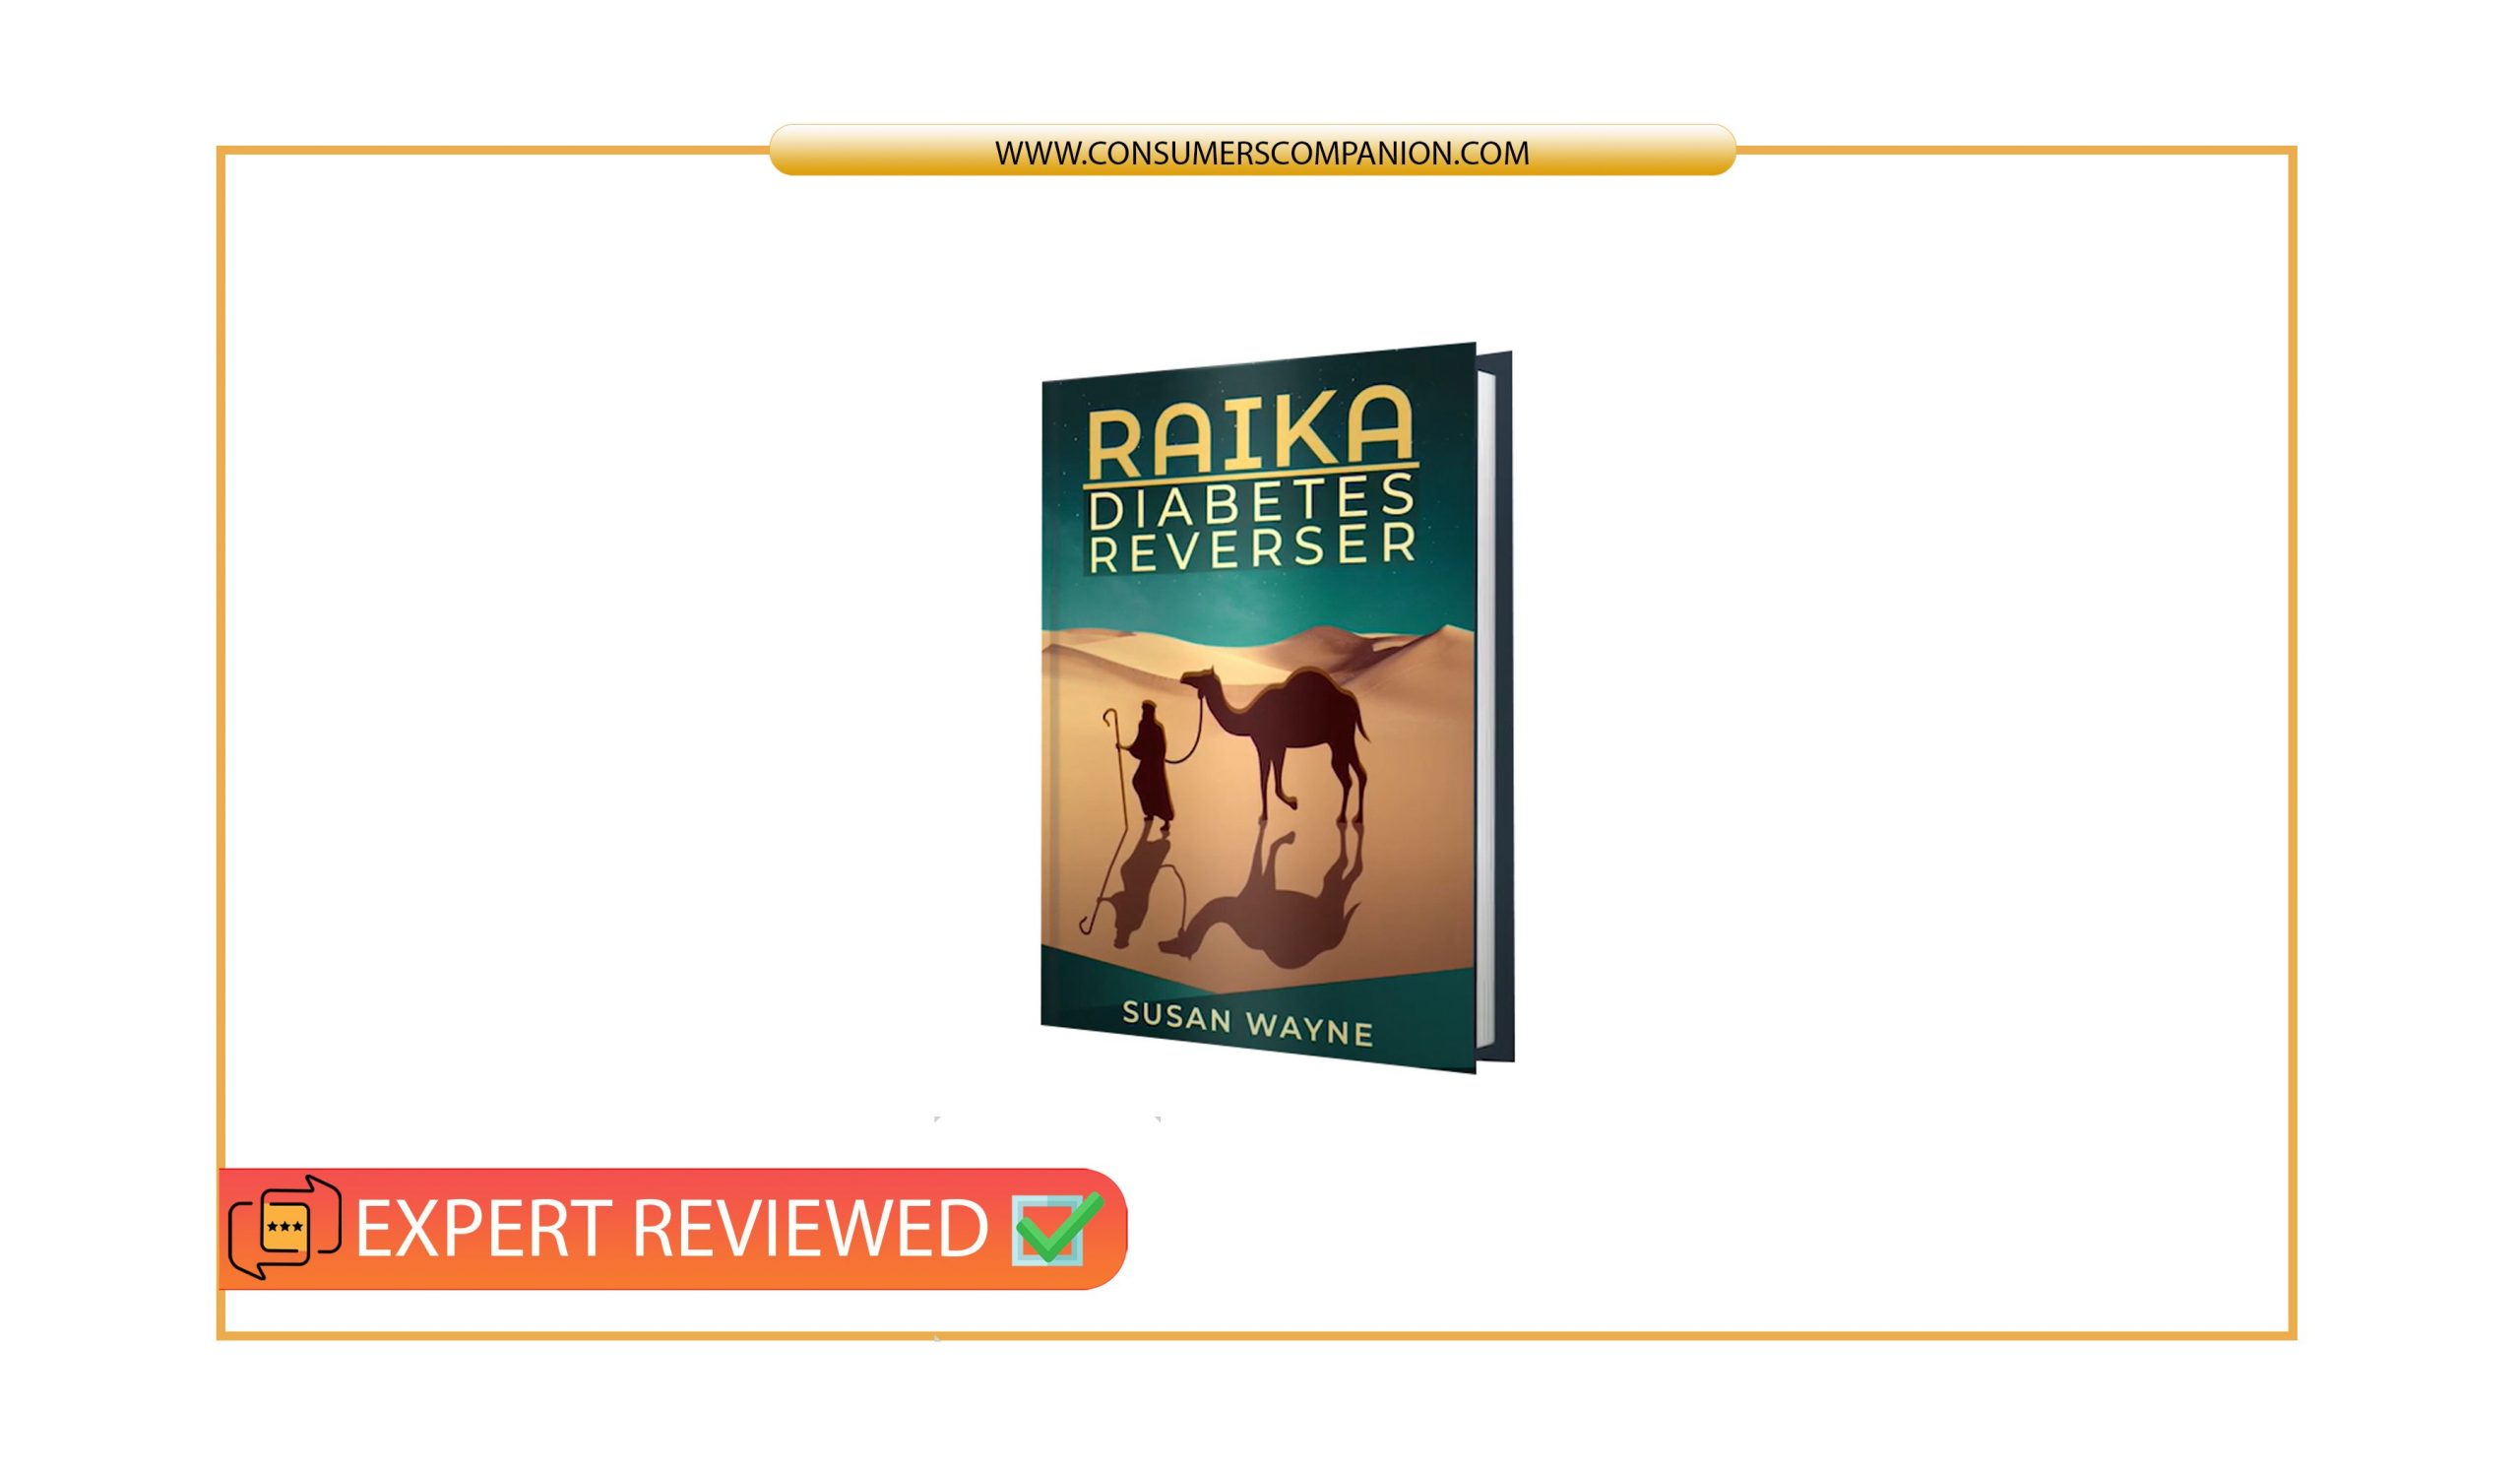 Raika Diabetes Reverser Reviews